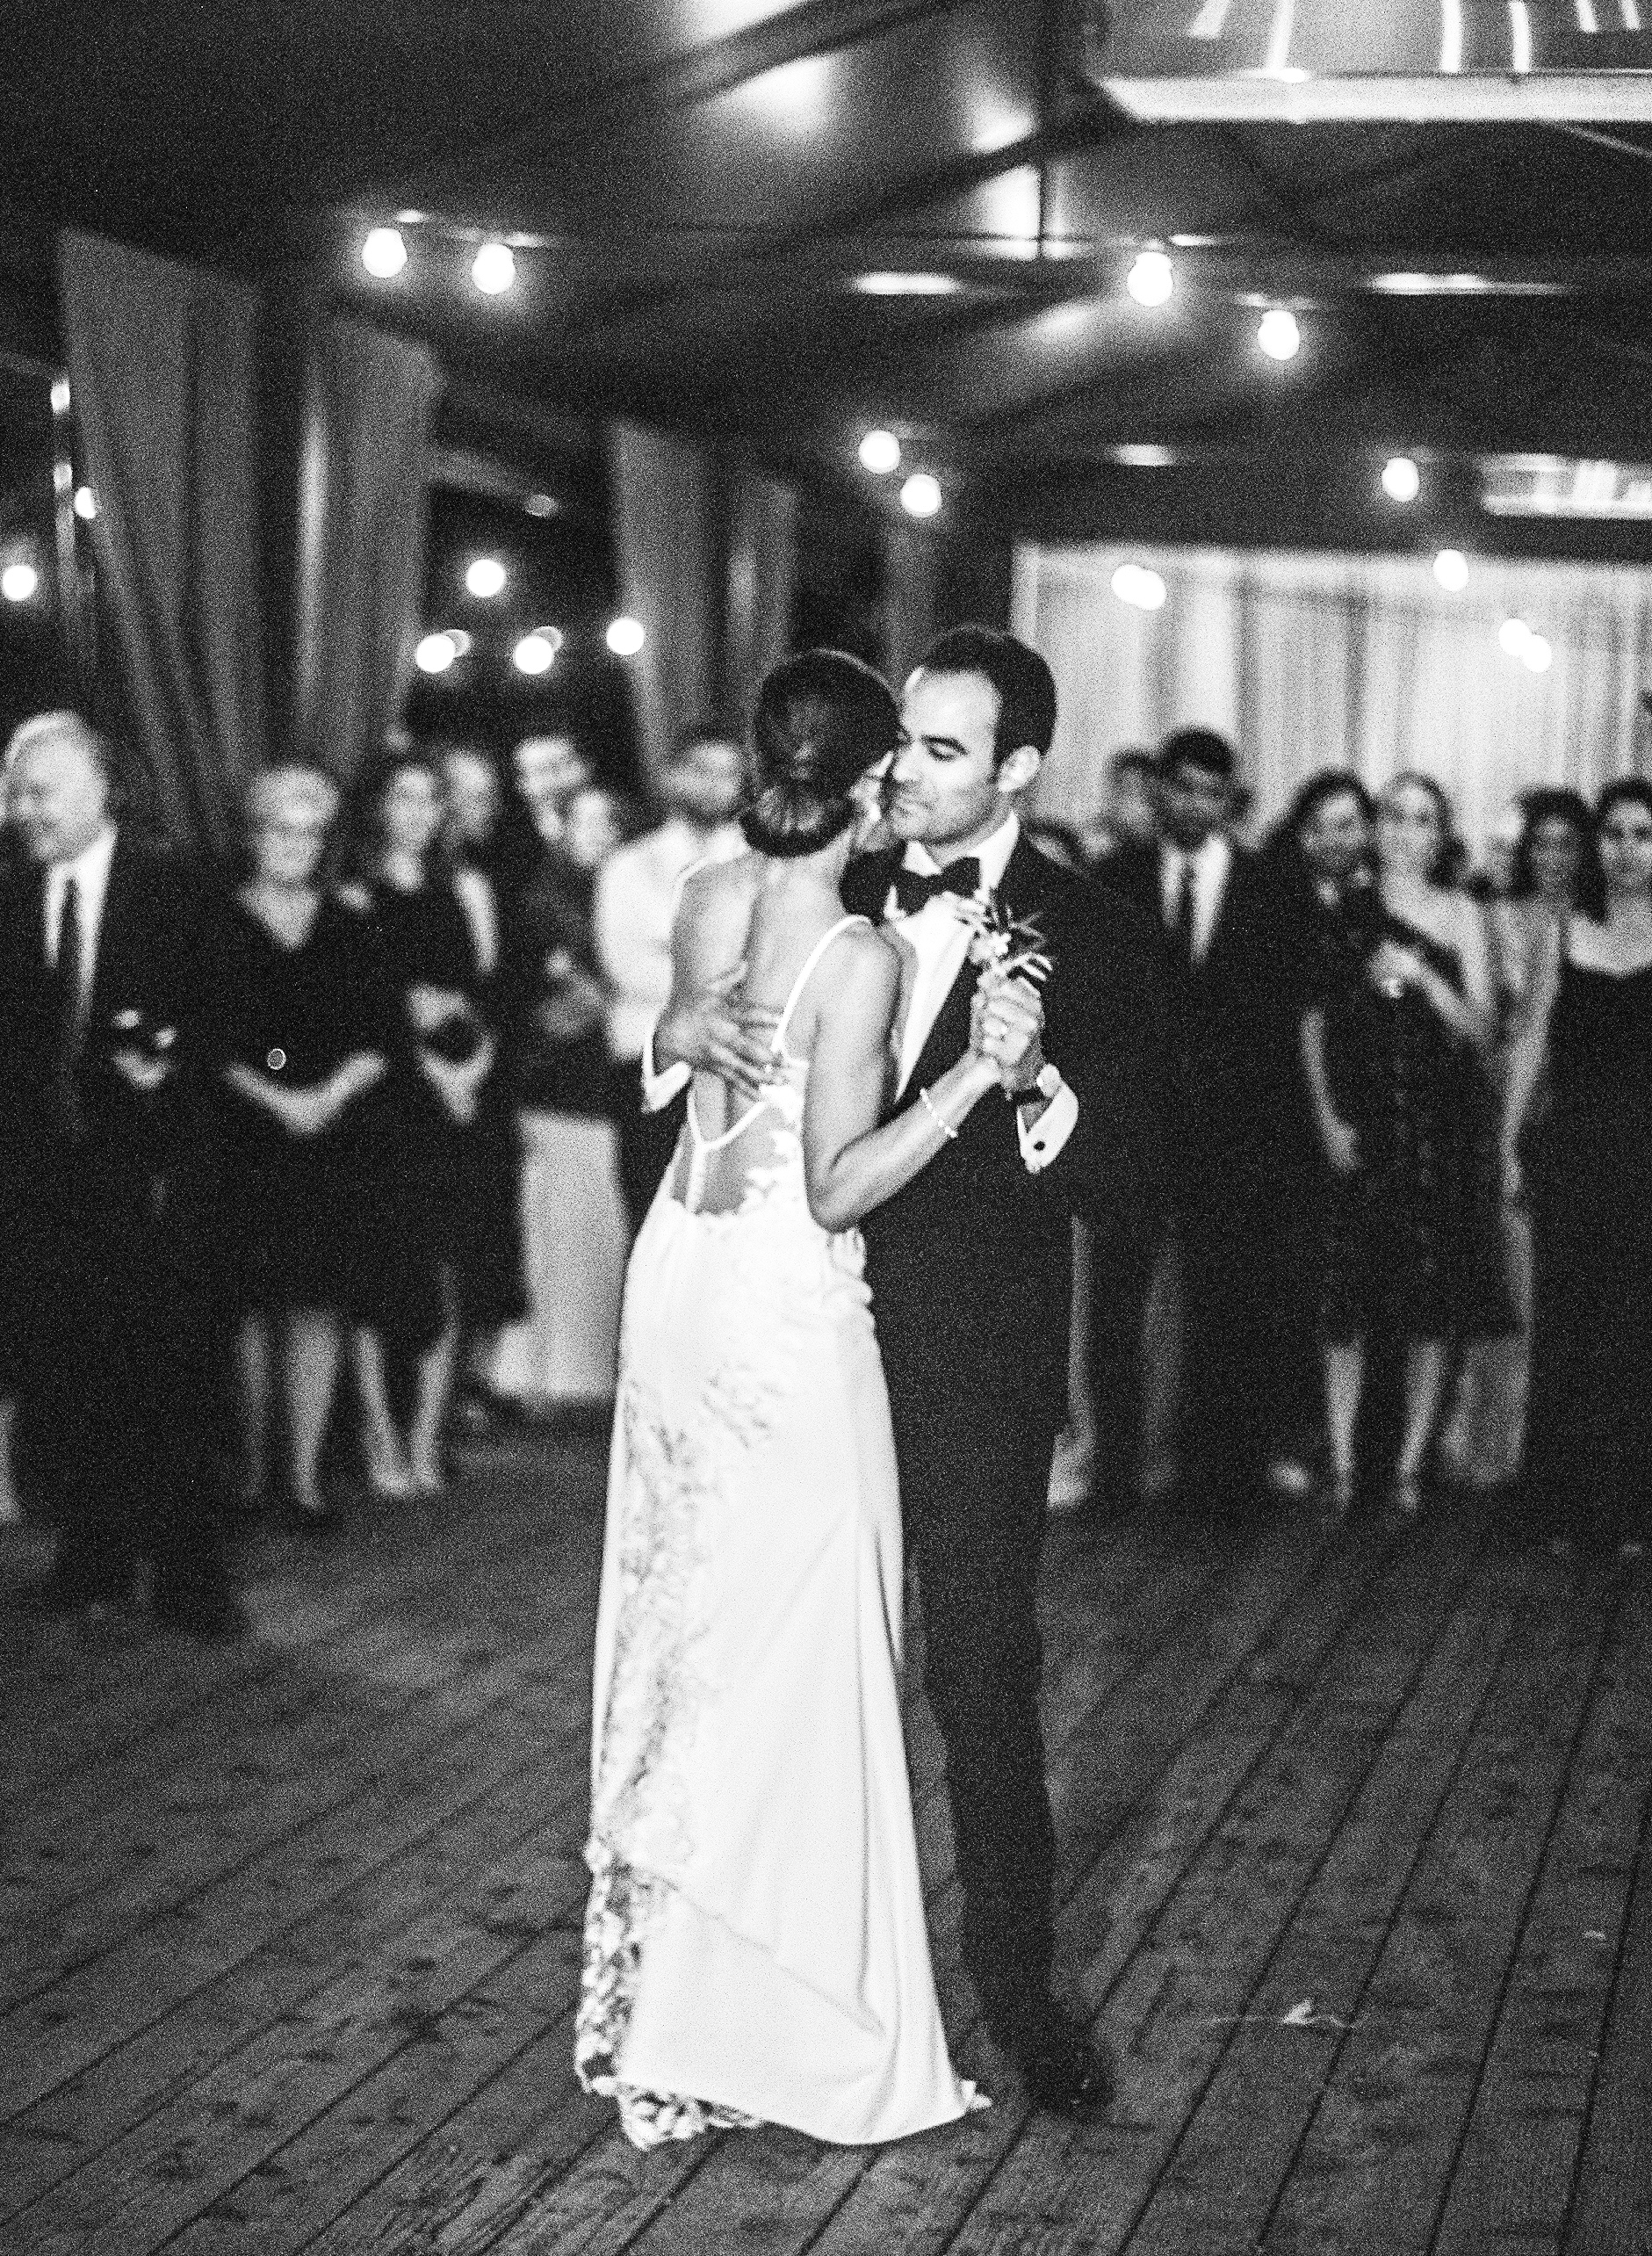 cristina chris wedding couple first dance black and white